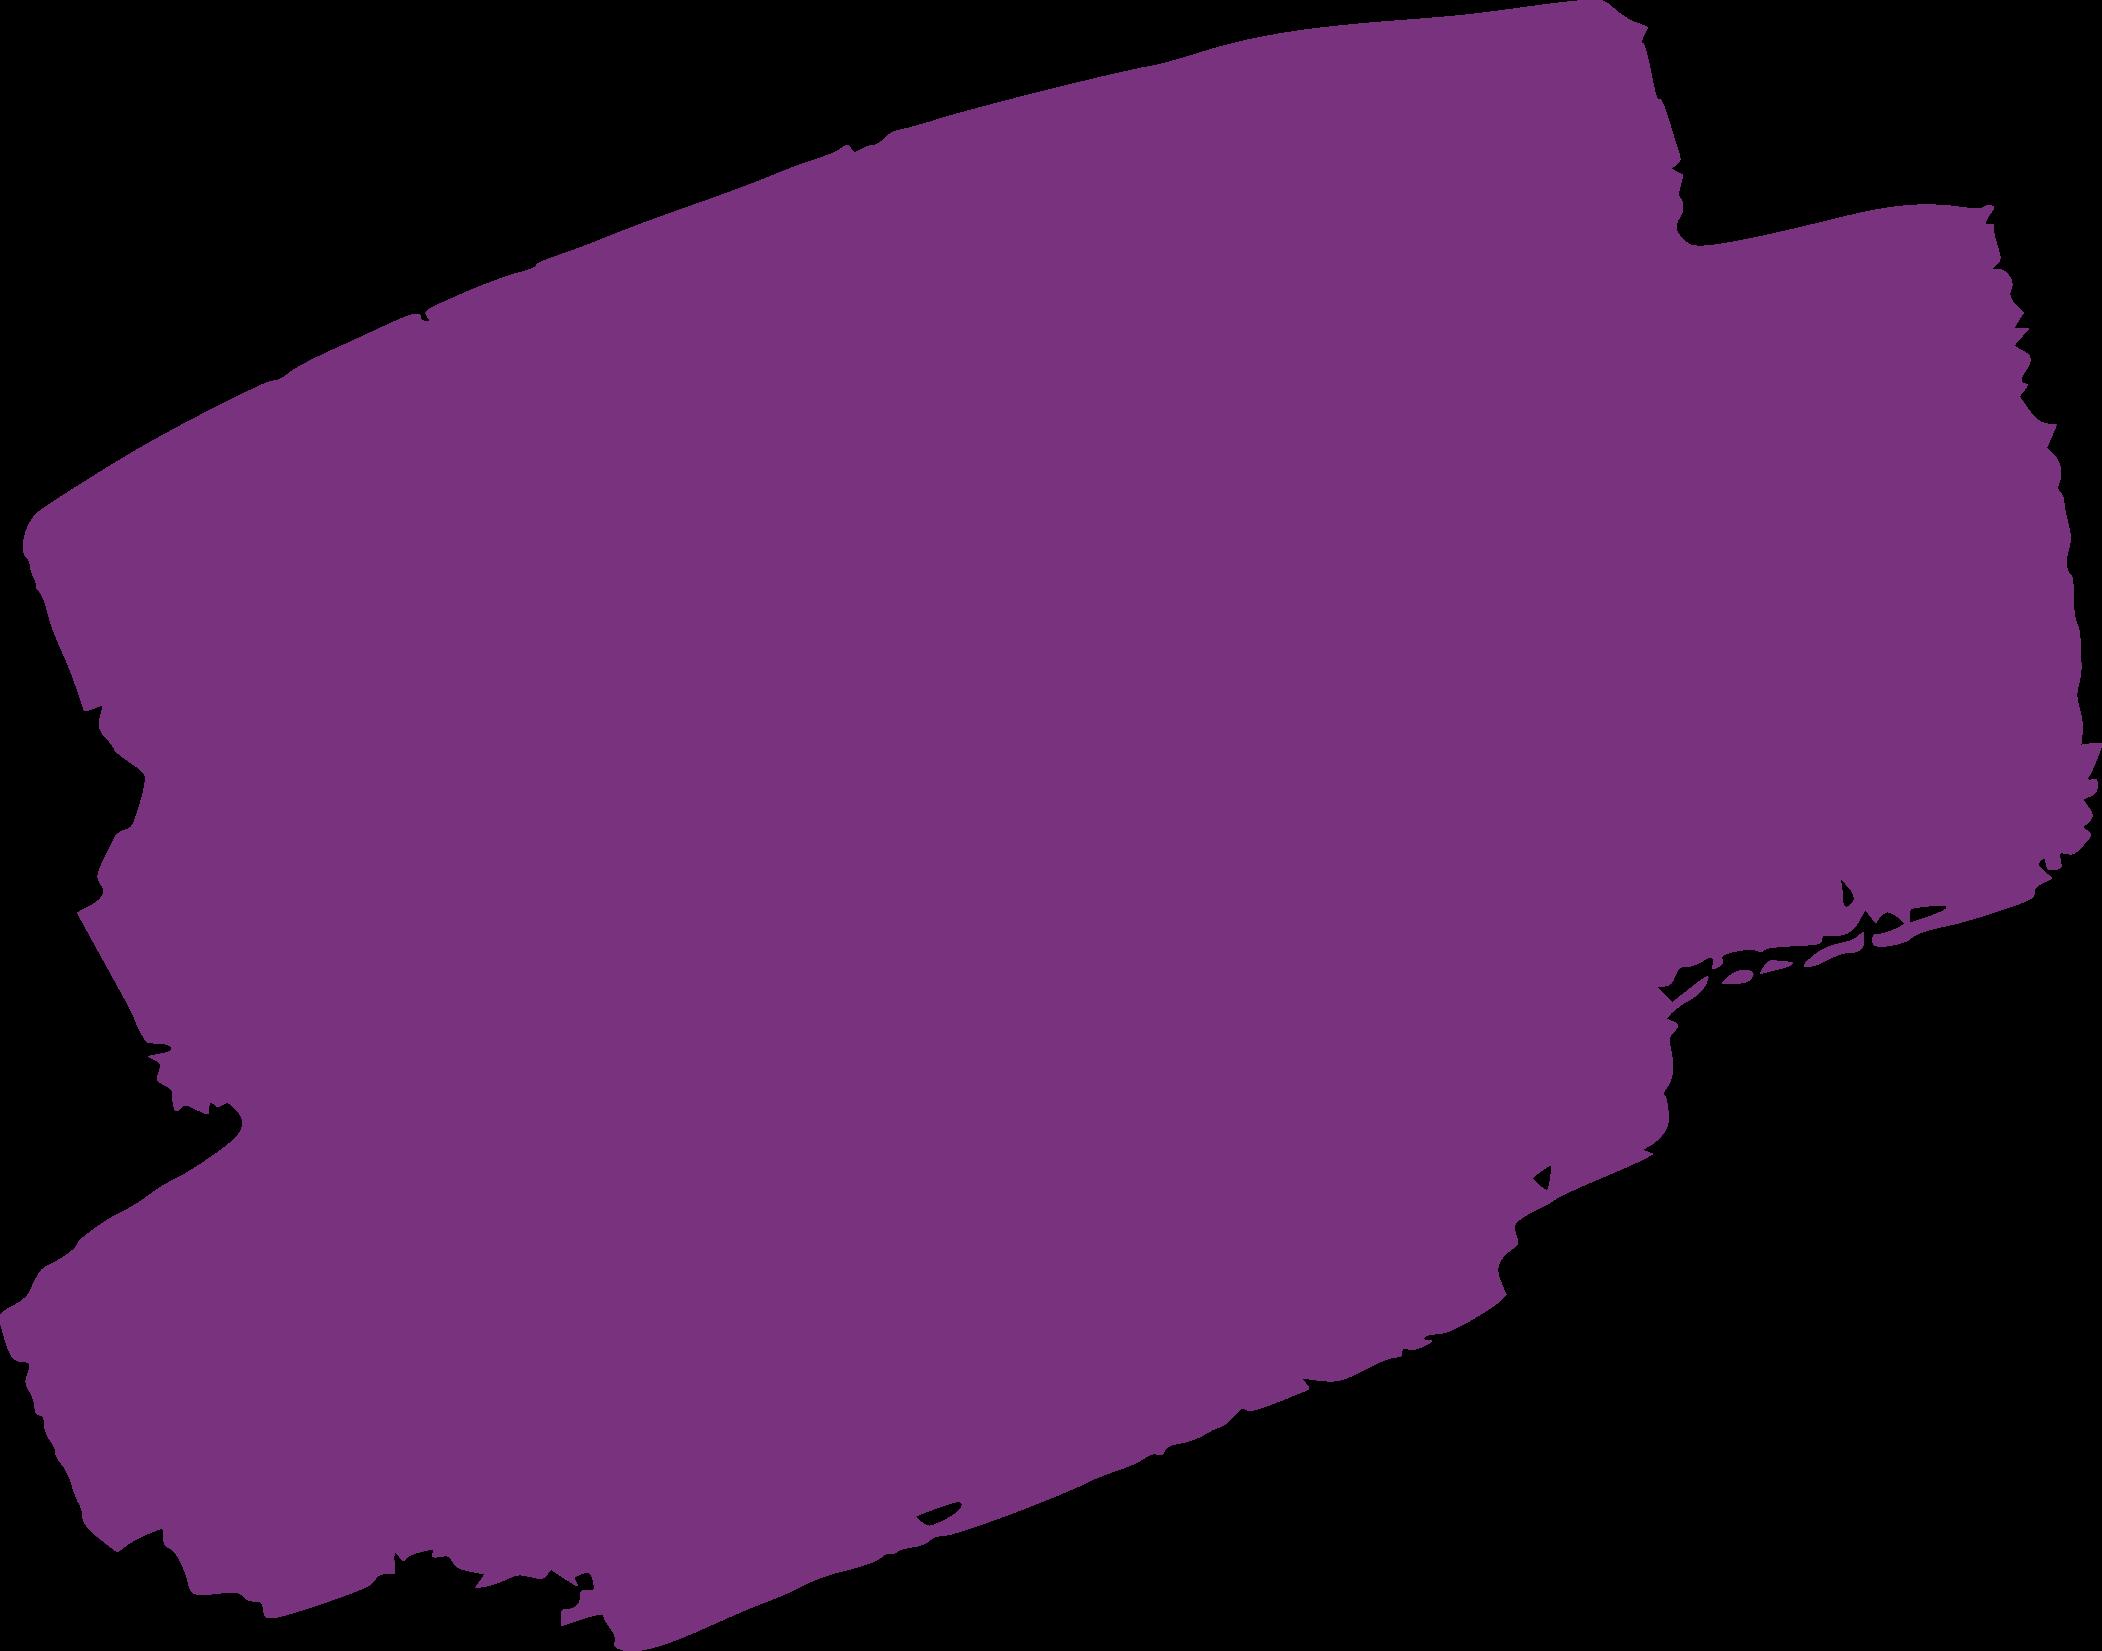 mancha-morada